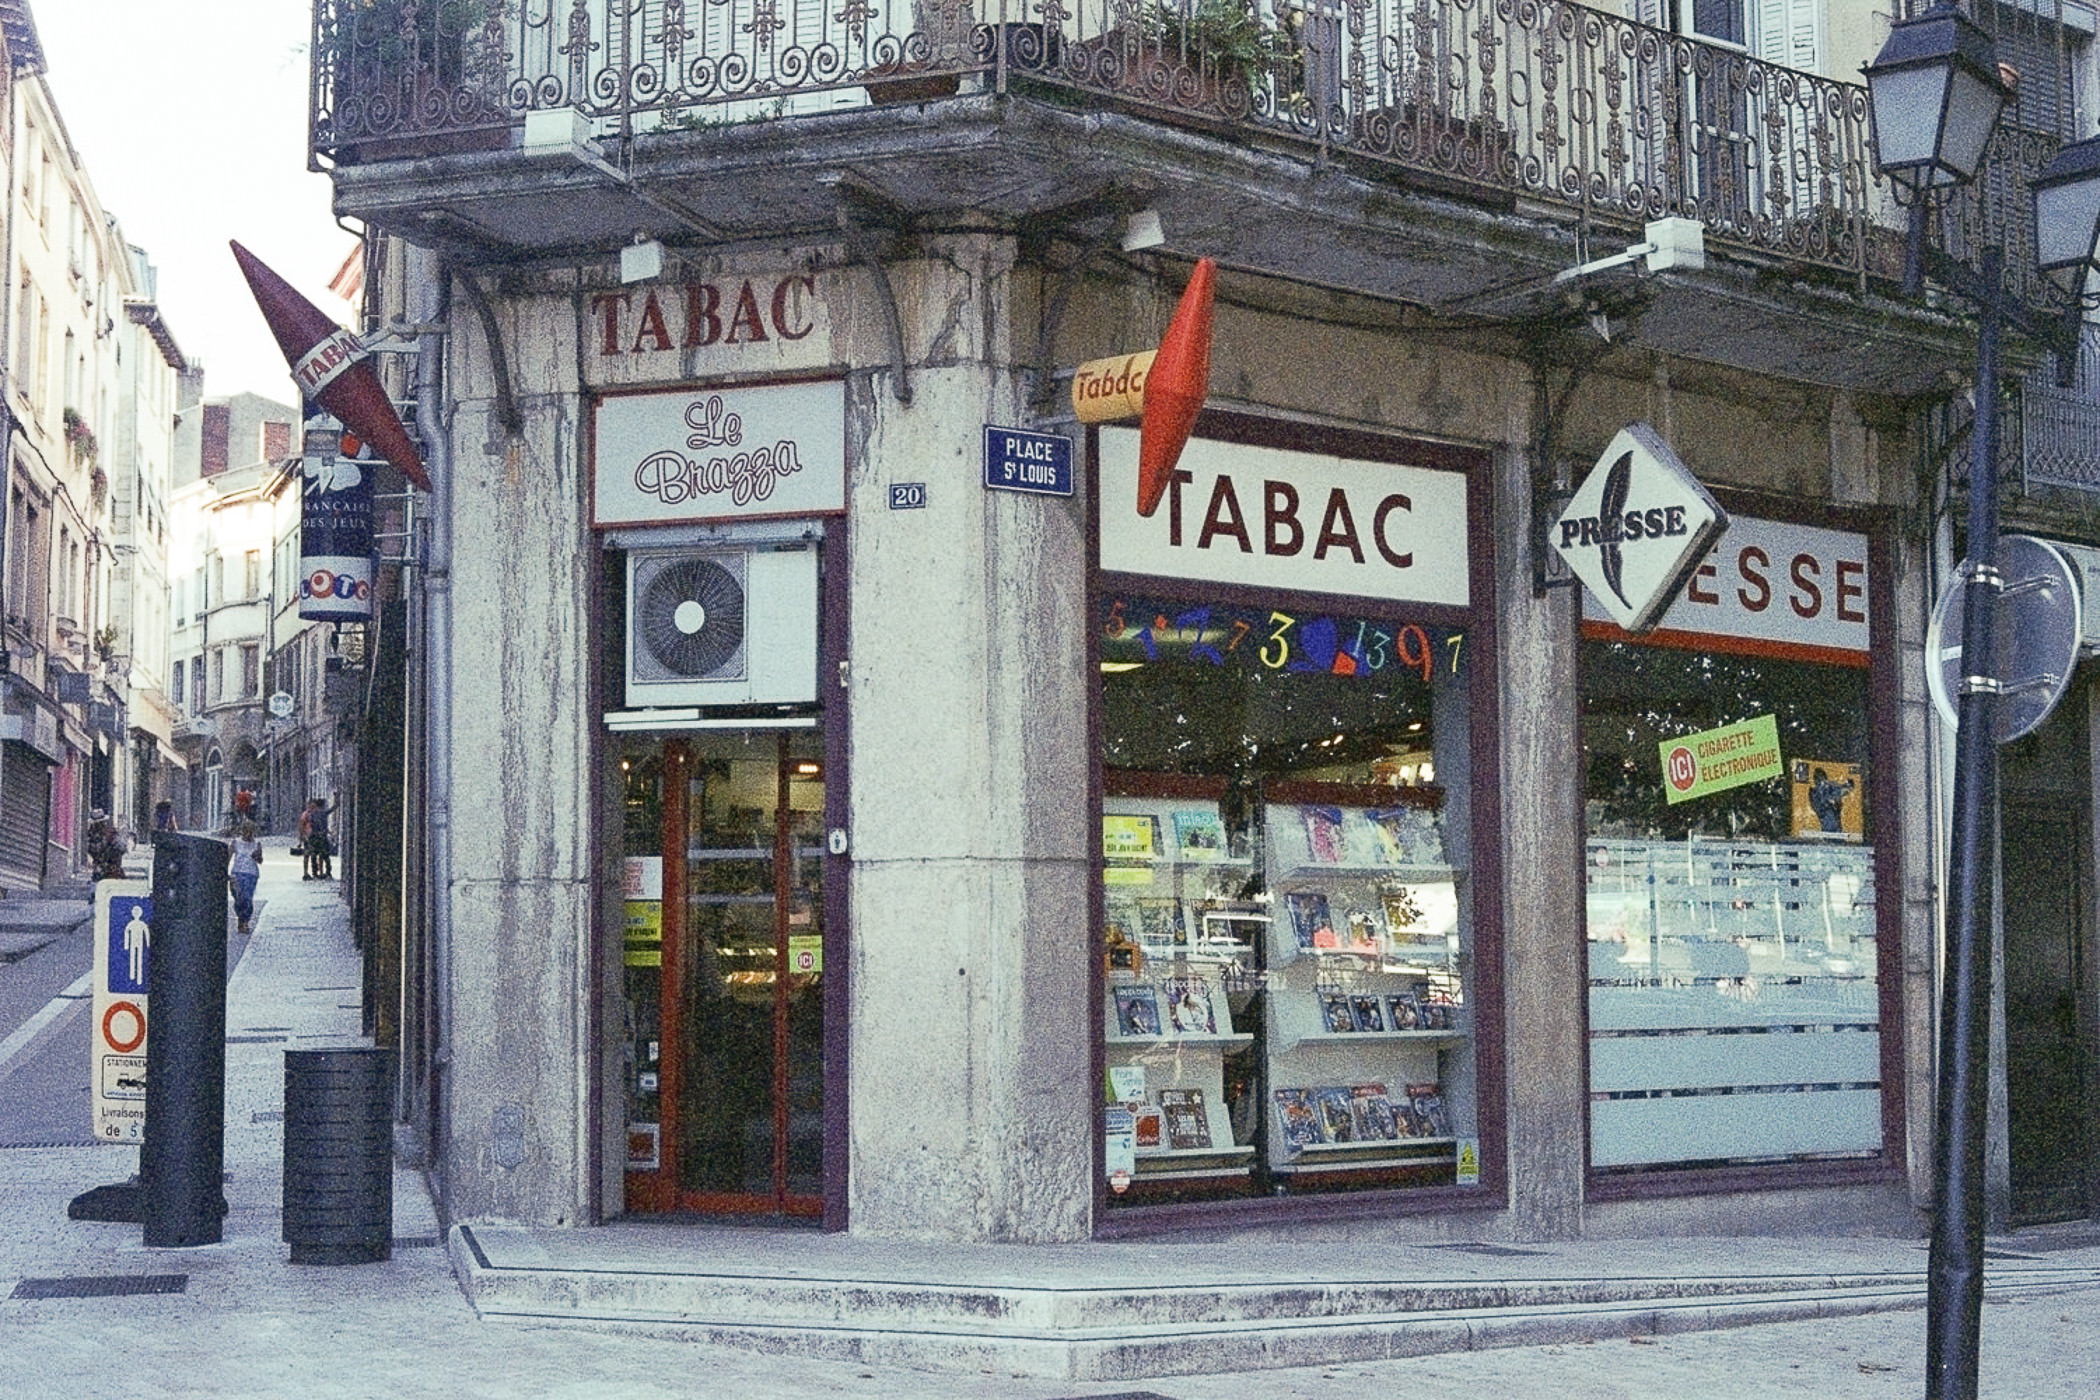 BAR TABAC_7.jpg